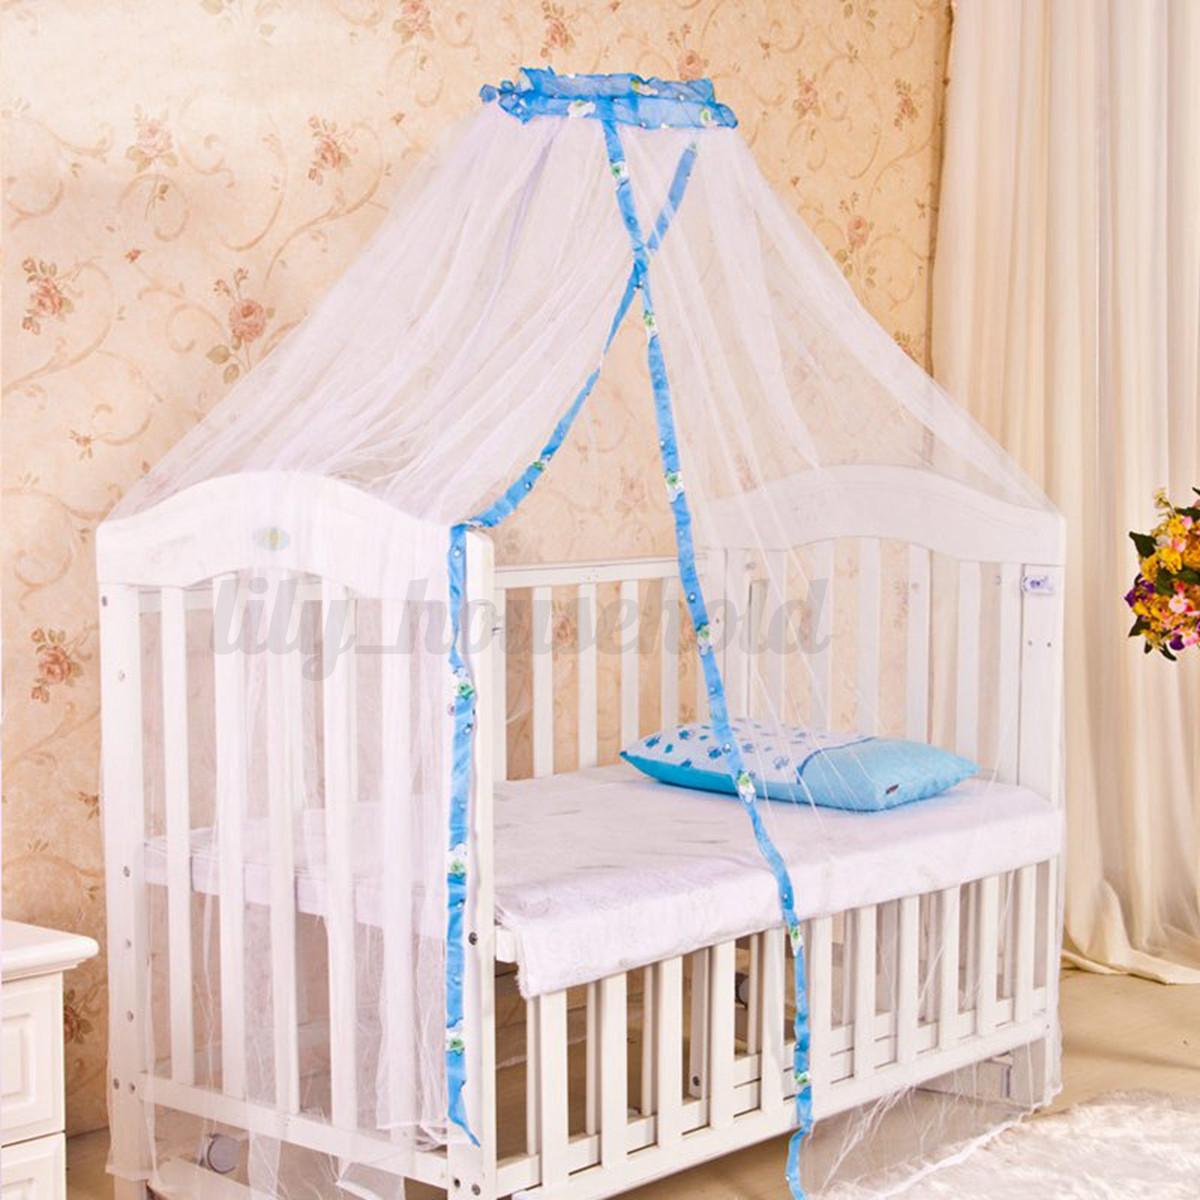 baby moskitonetz himmel babybett insektenschutz. Black Bedroom Furniture Sets. Home Design Ideas